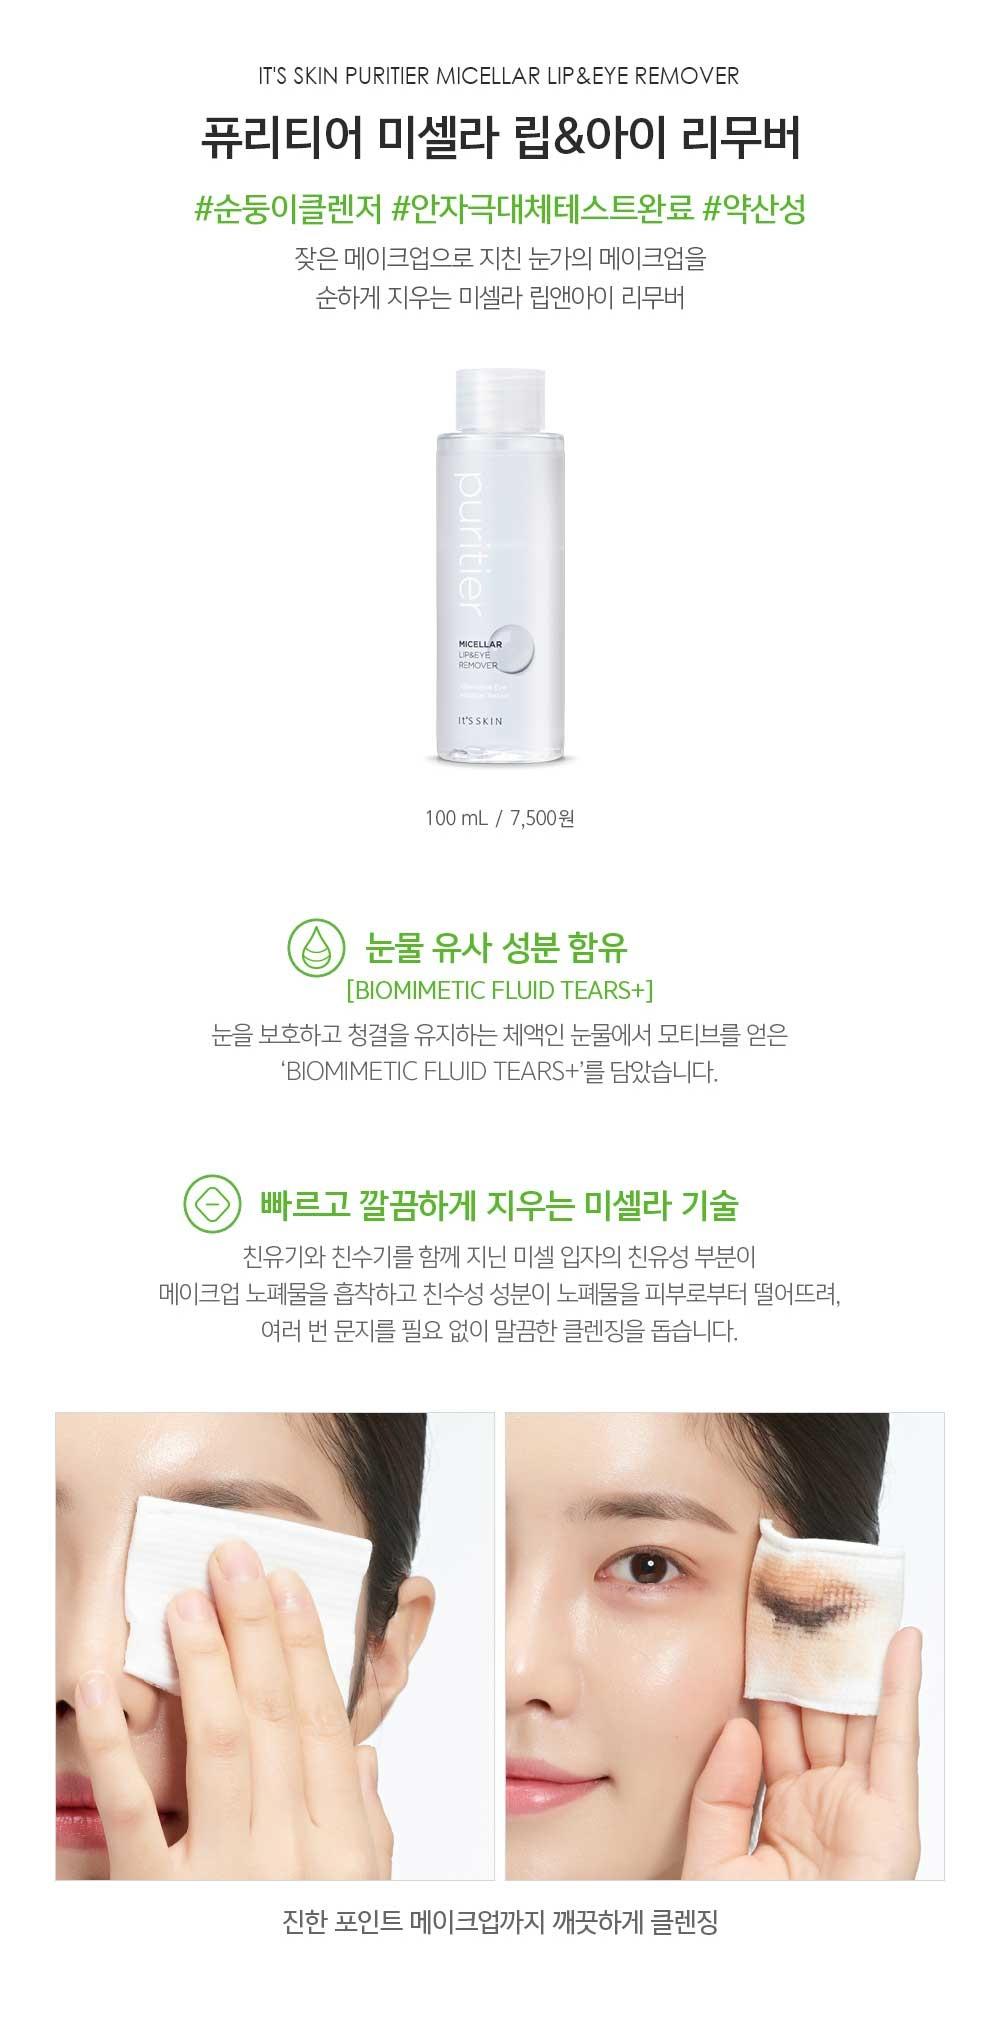 It's Skin Puritier Micellar Lip and Eye Remover 100ml